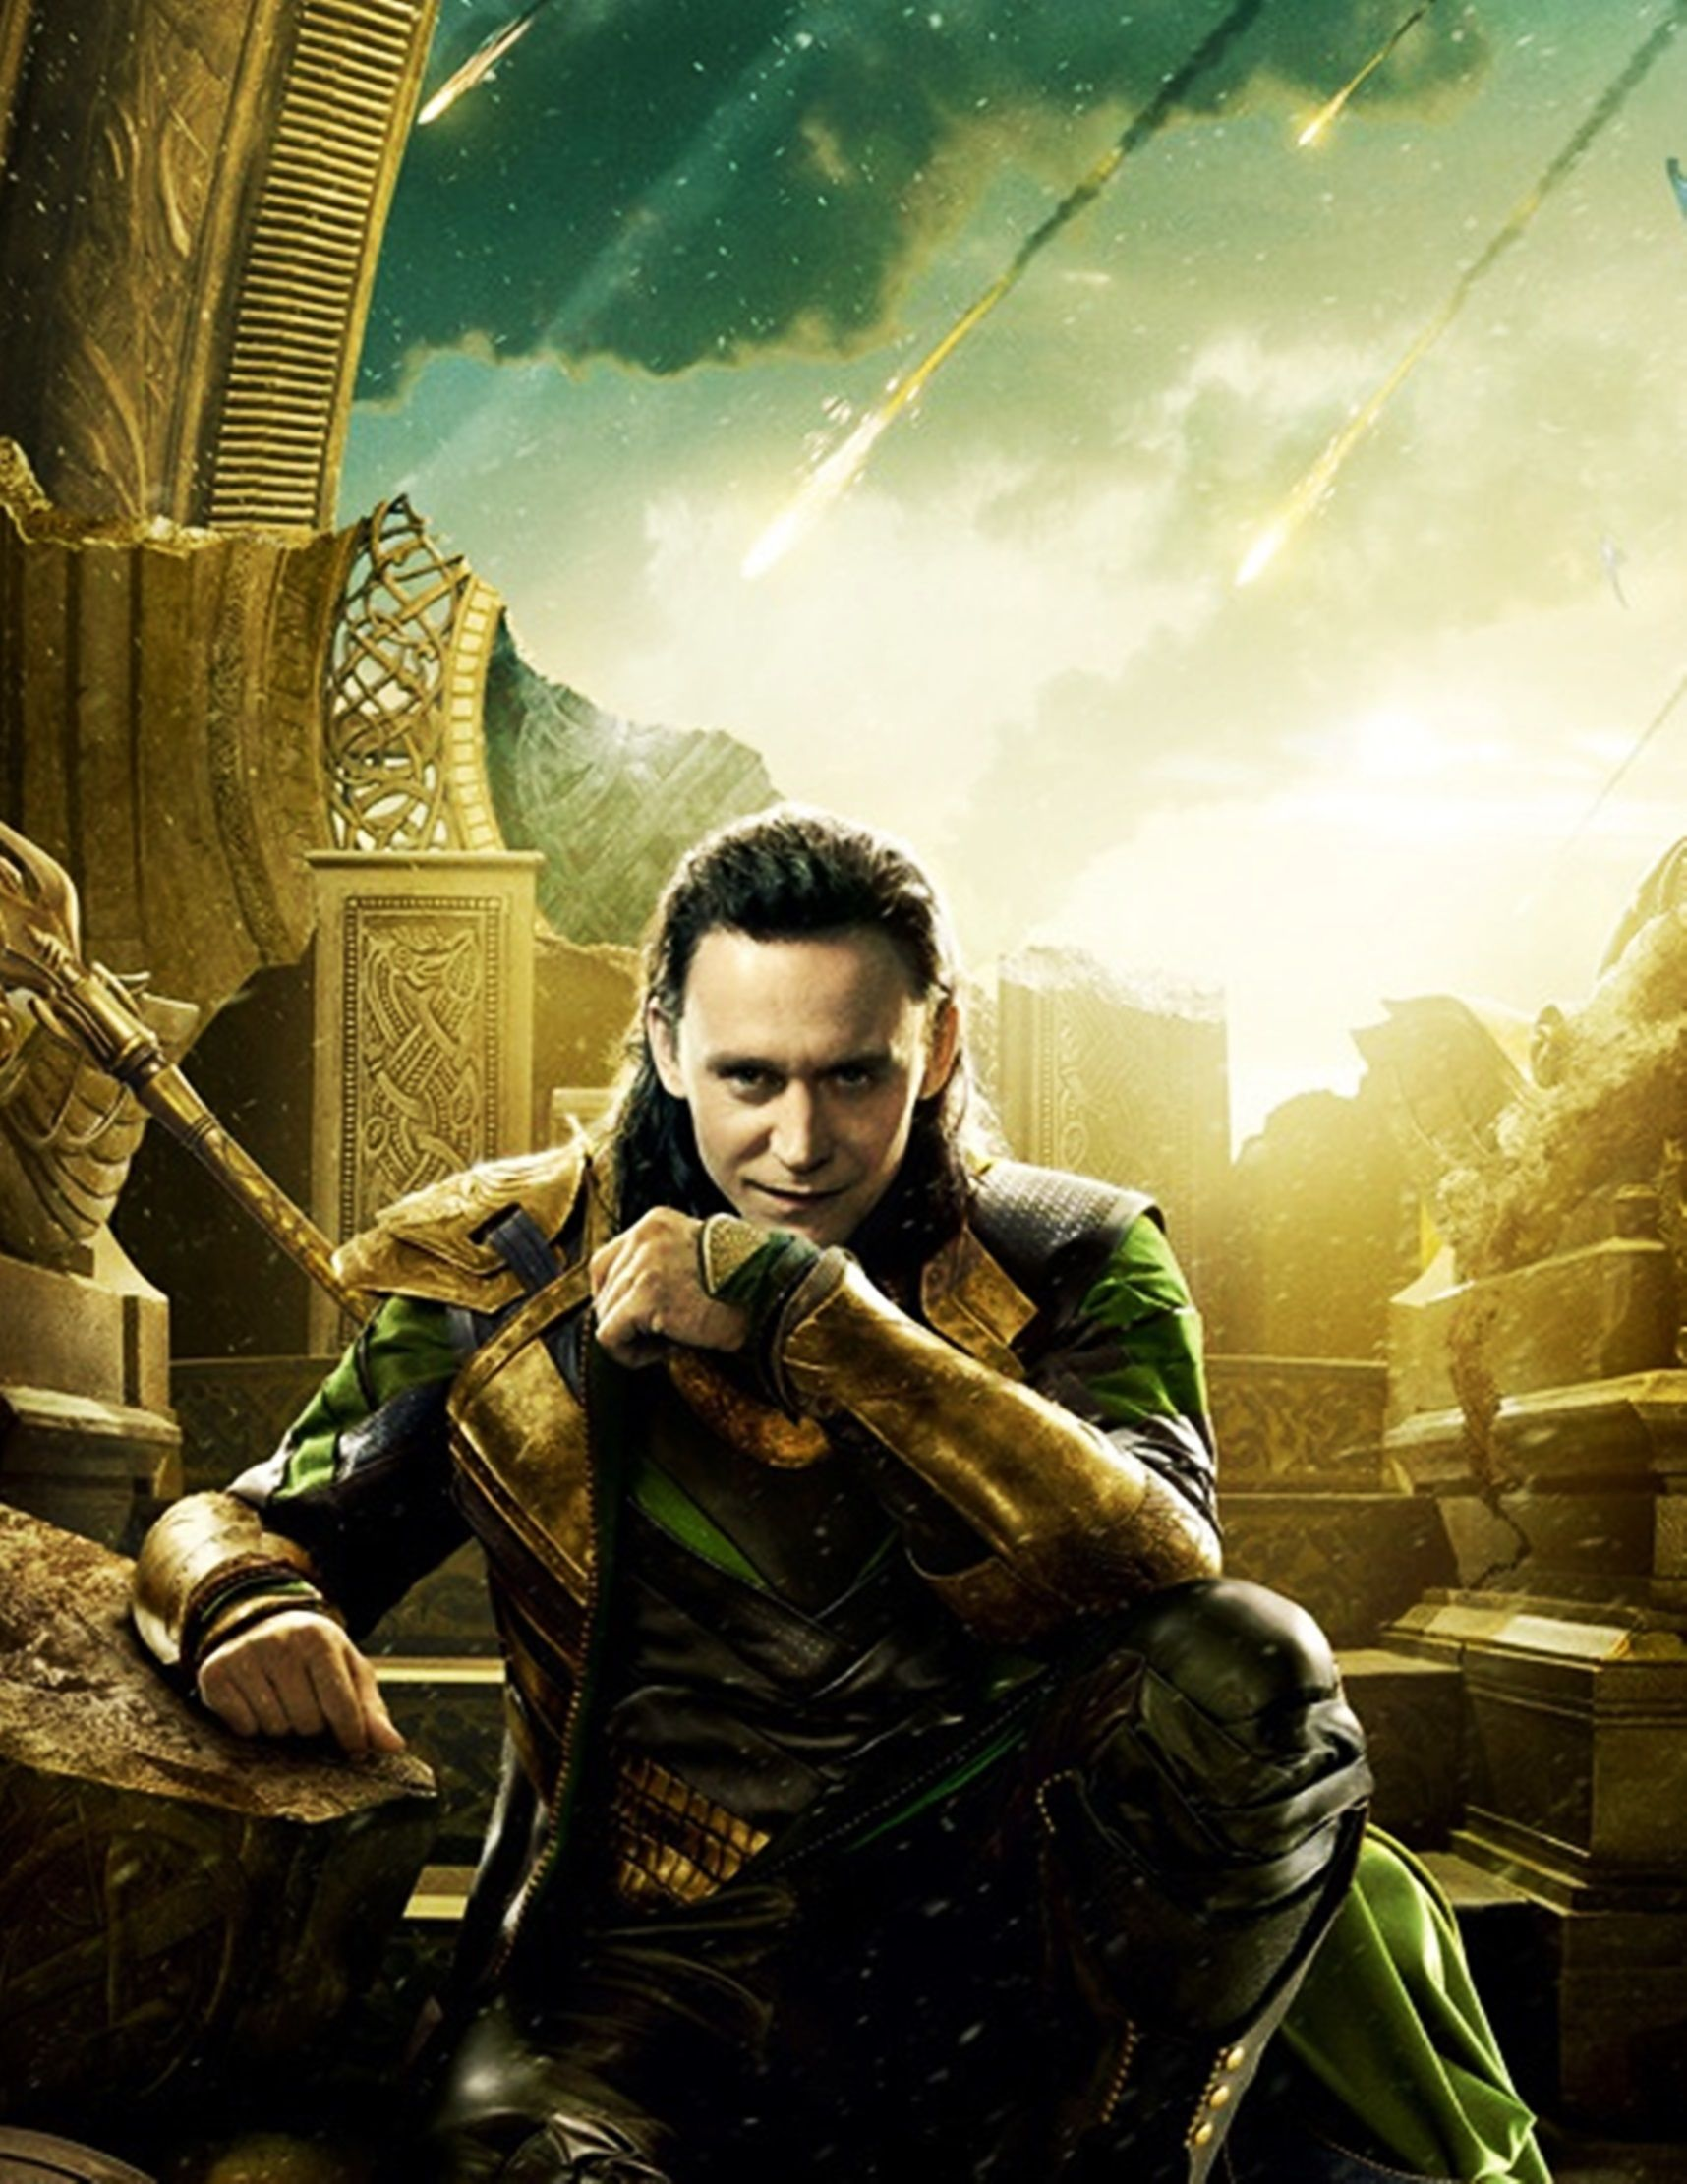 Tom Hiddleston Loki poster, Loki wallpaper, Loki thor